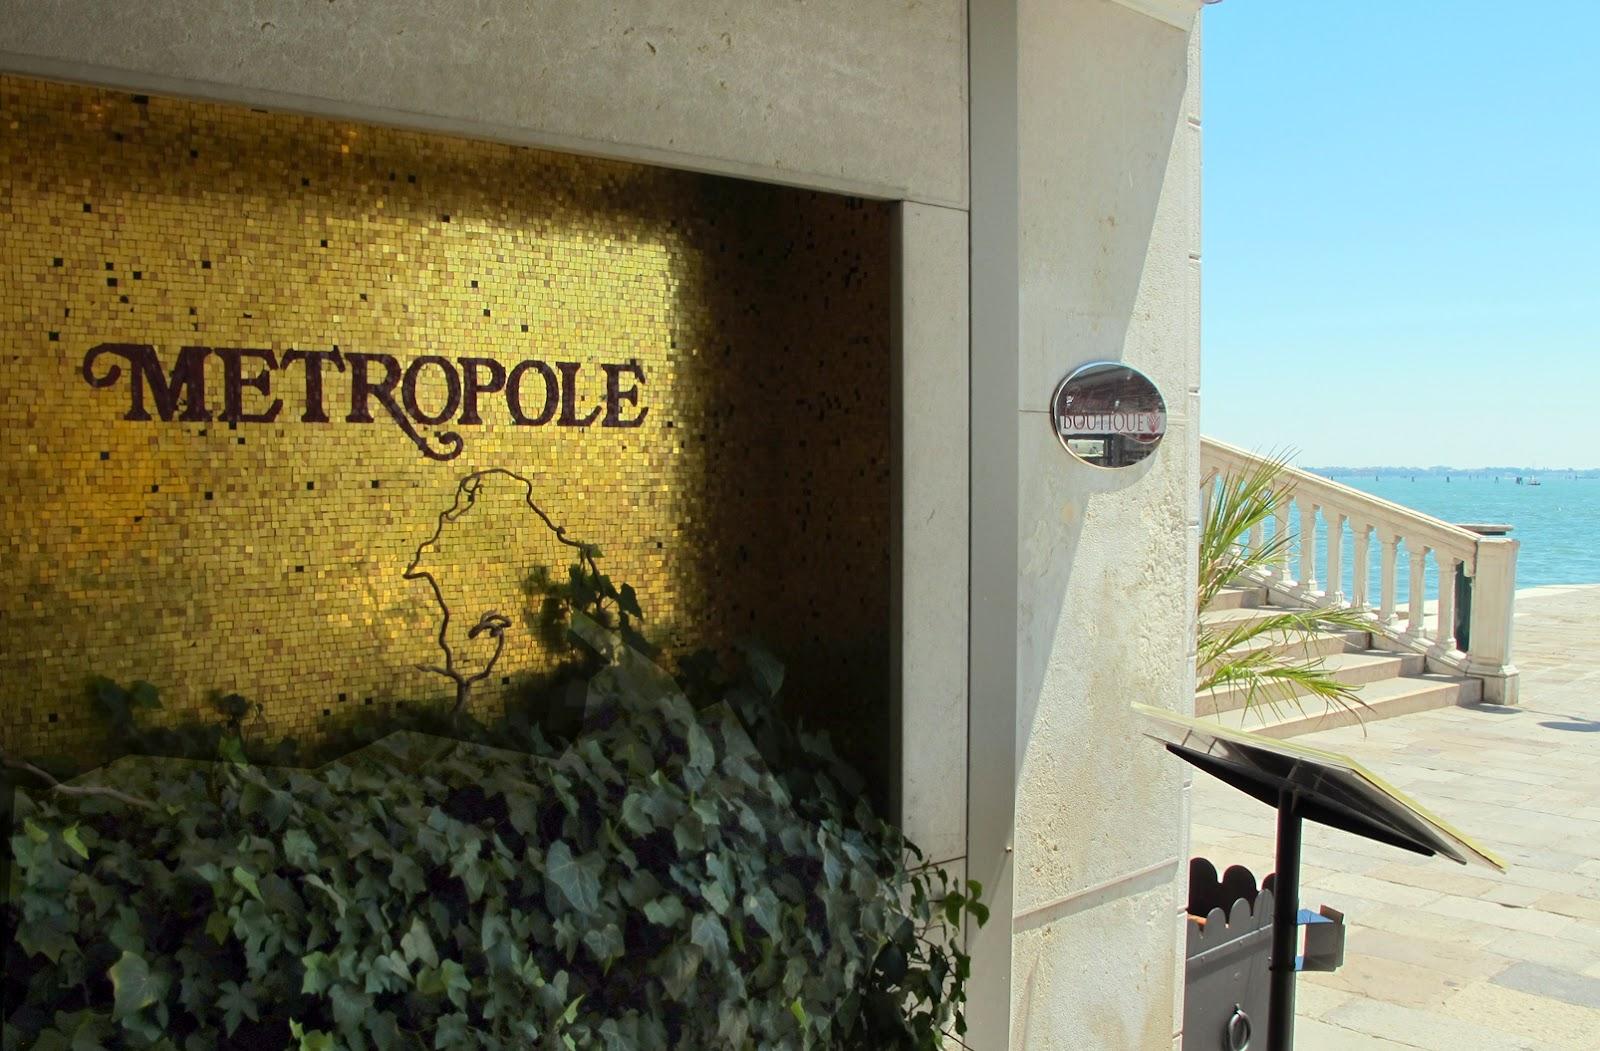 http://2.bp.blogspot.com/-GukZdClaULw/T_hzk3C24TI/AAAAAAAADDU/uV1QgBiPVq0/s1600/Hotel+Metropole+in+Venice.jpg